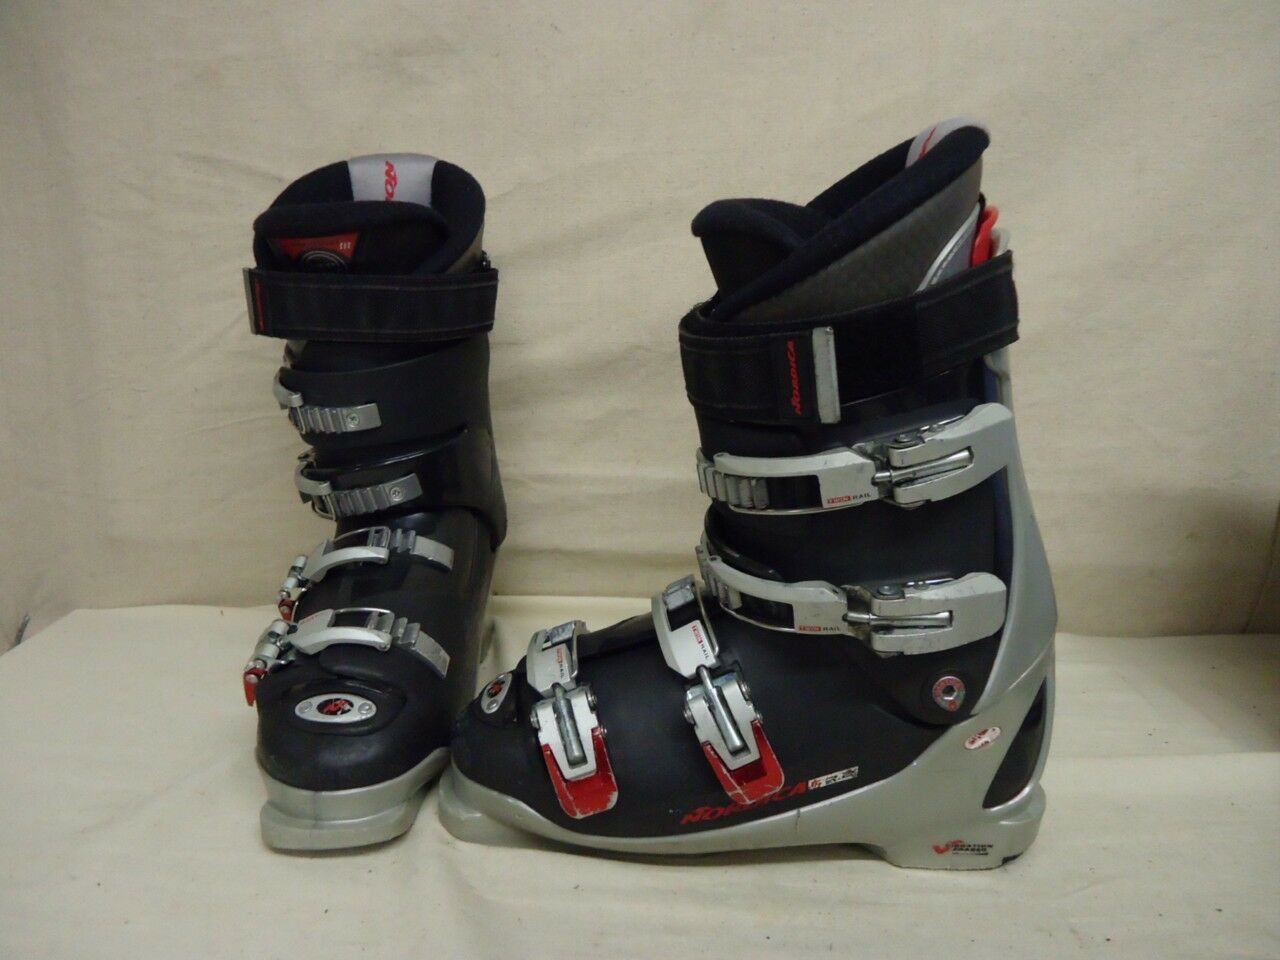 NORDICA Women's K 7.2  Ski Boots Size 9.5 US 26.5 Mondo